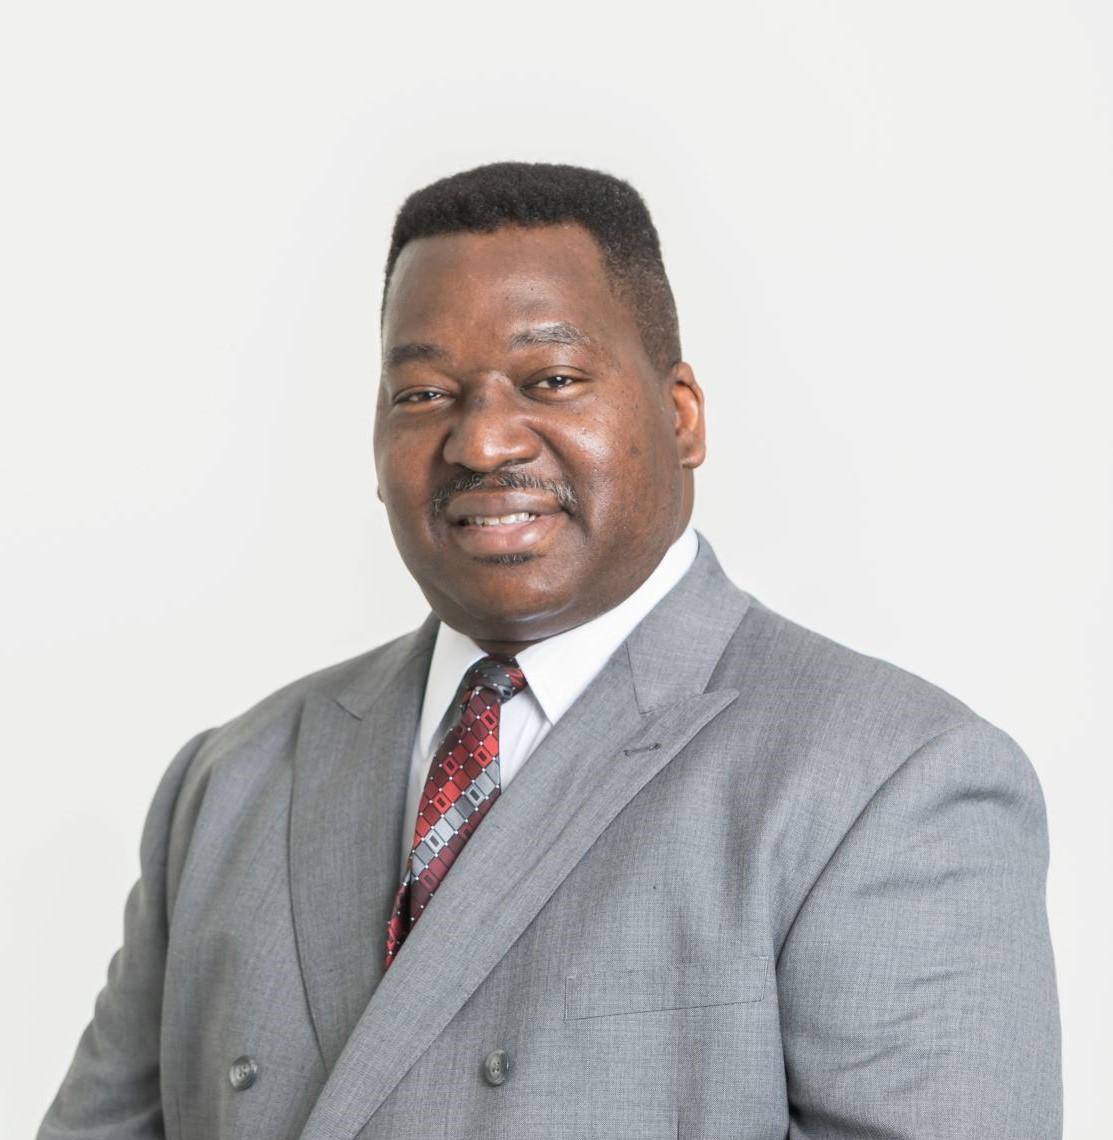 SHERWOOD L. BROWN  Your Registered Representative & Insurance Agent